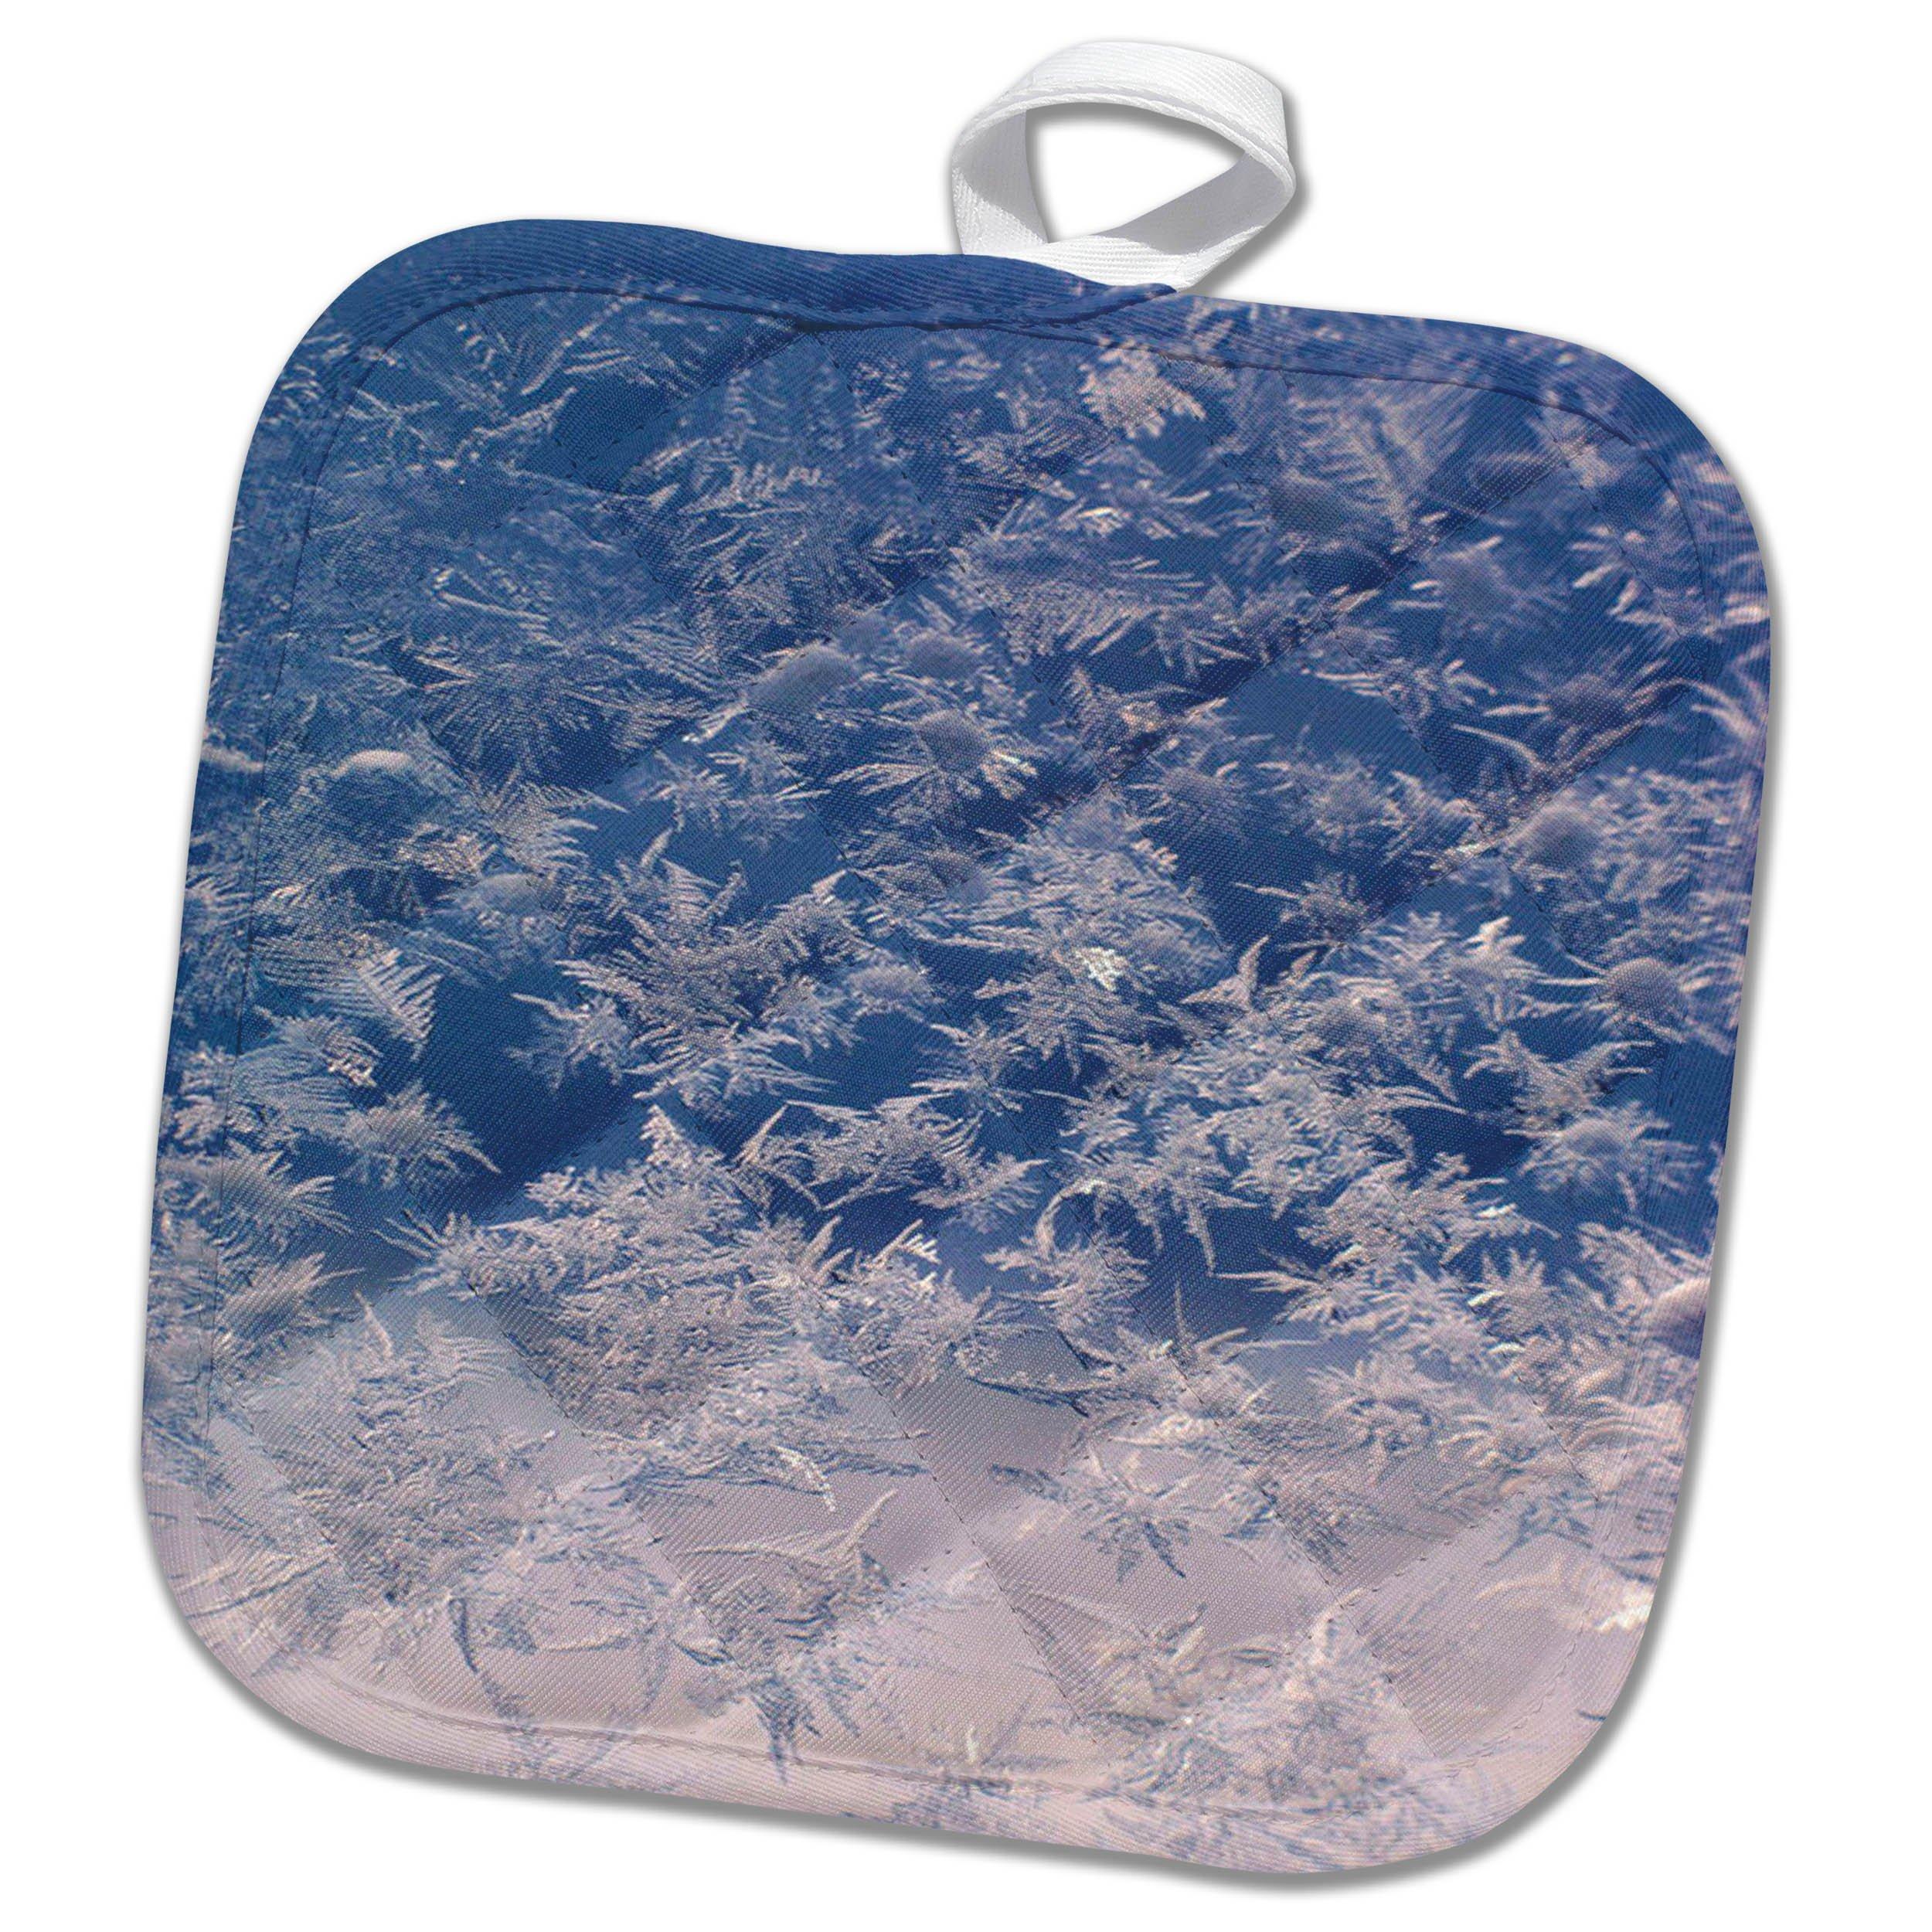 3dRose TDSwhite – Winter Seasonal Nature Photos - Window Snowflakes - 8x8 Potholder (phl_284946_1)